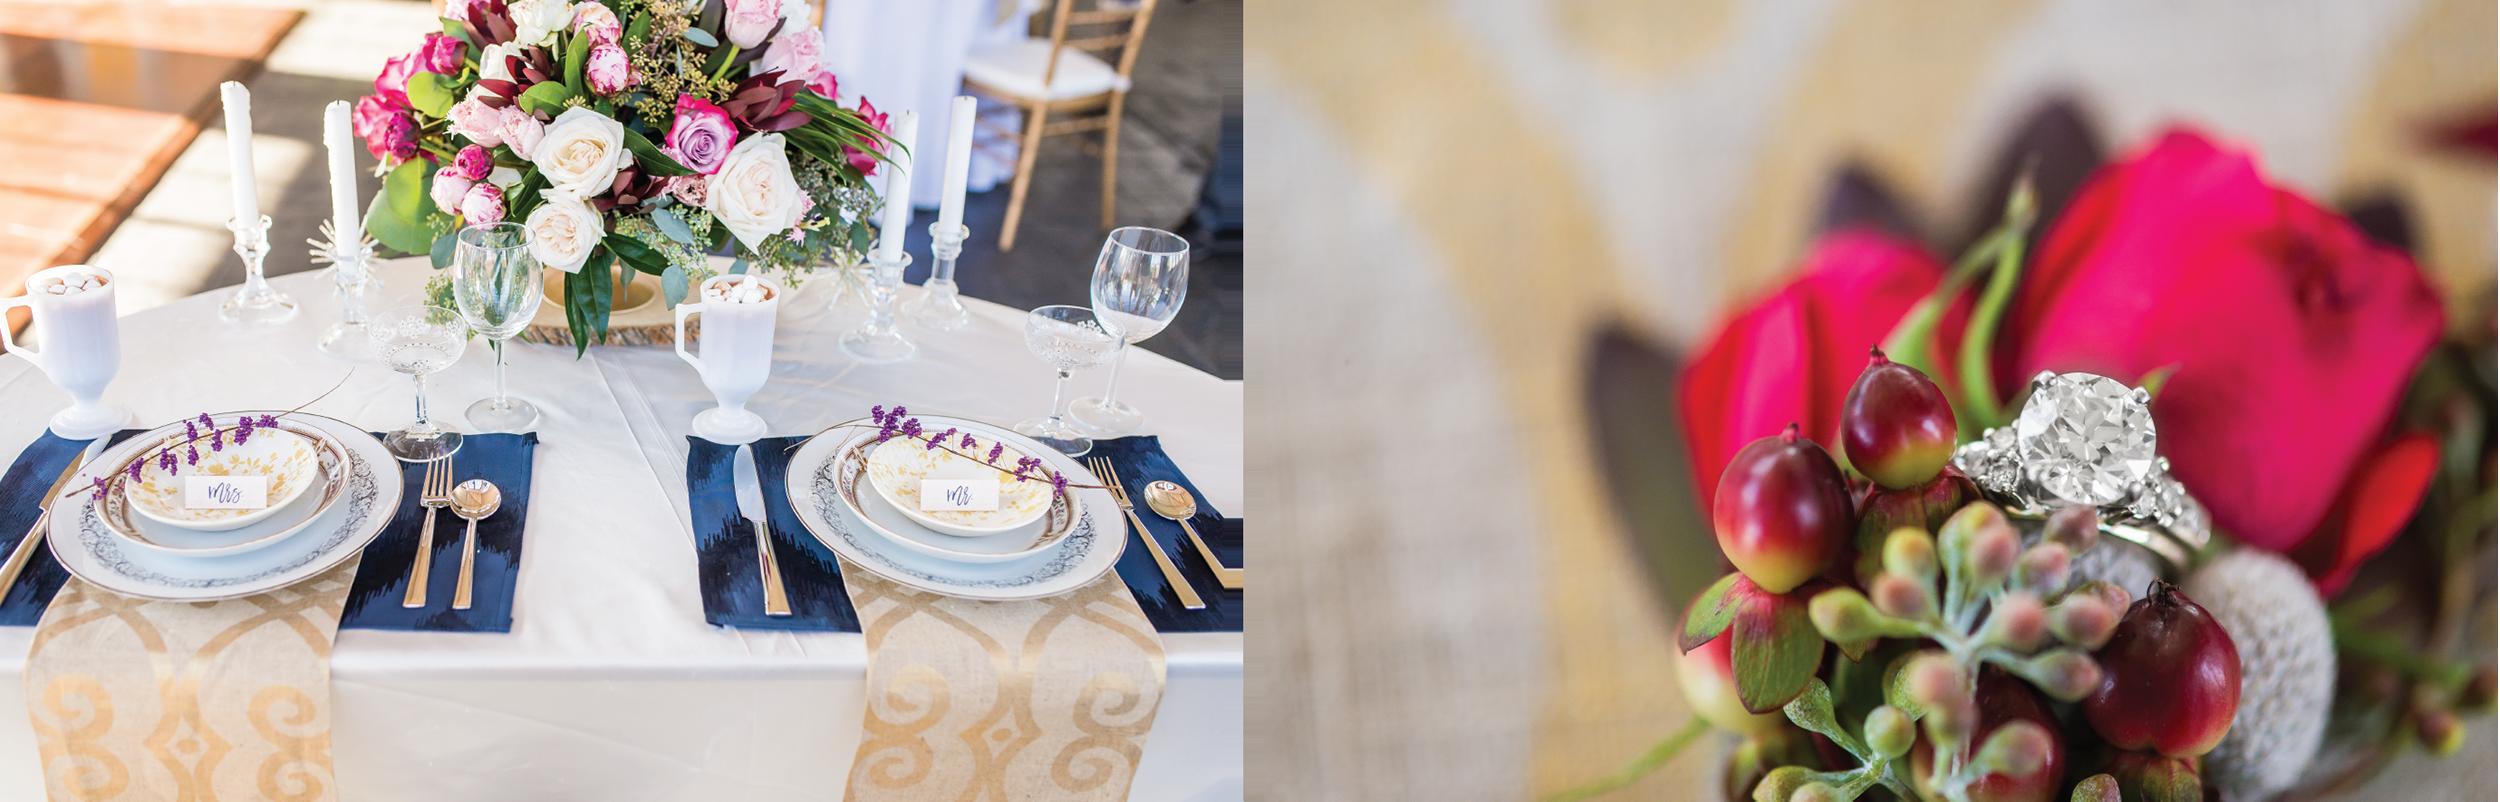 winter wedding styled shoot, wedding invitation inspiration